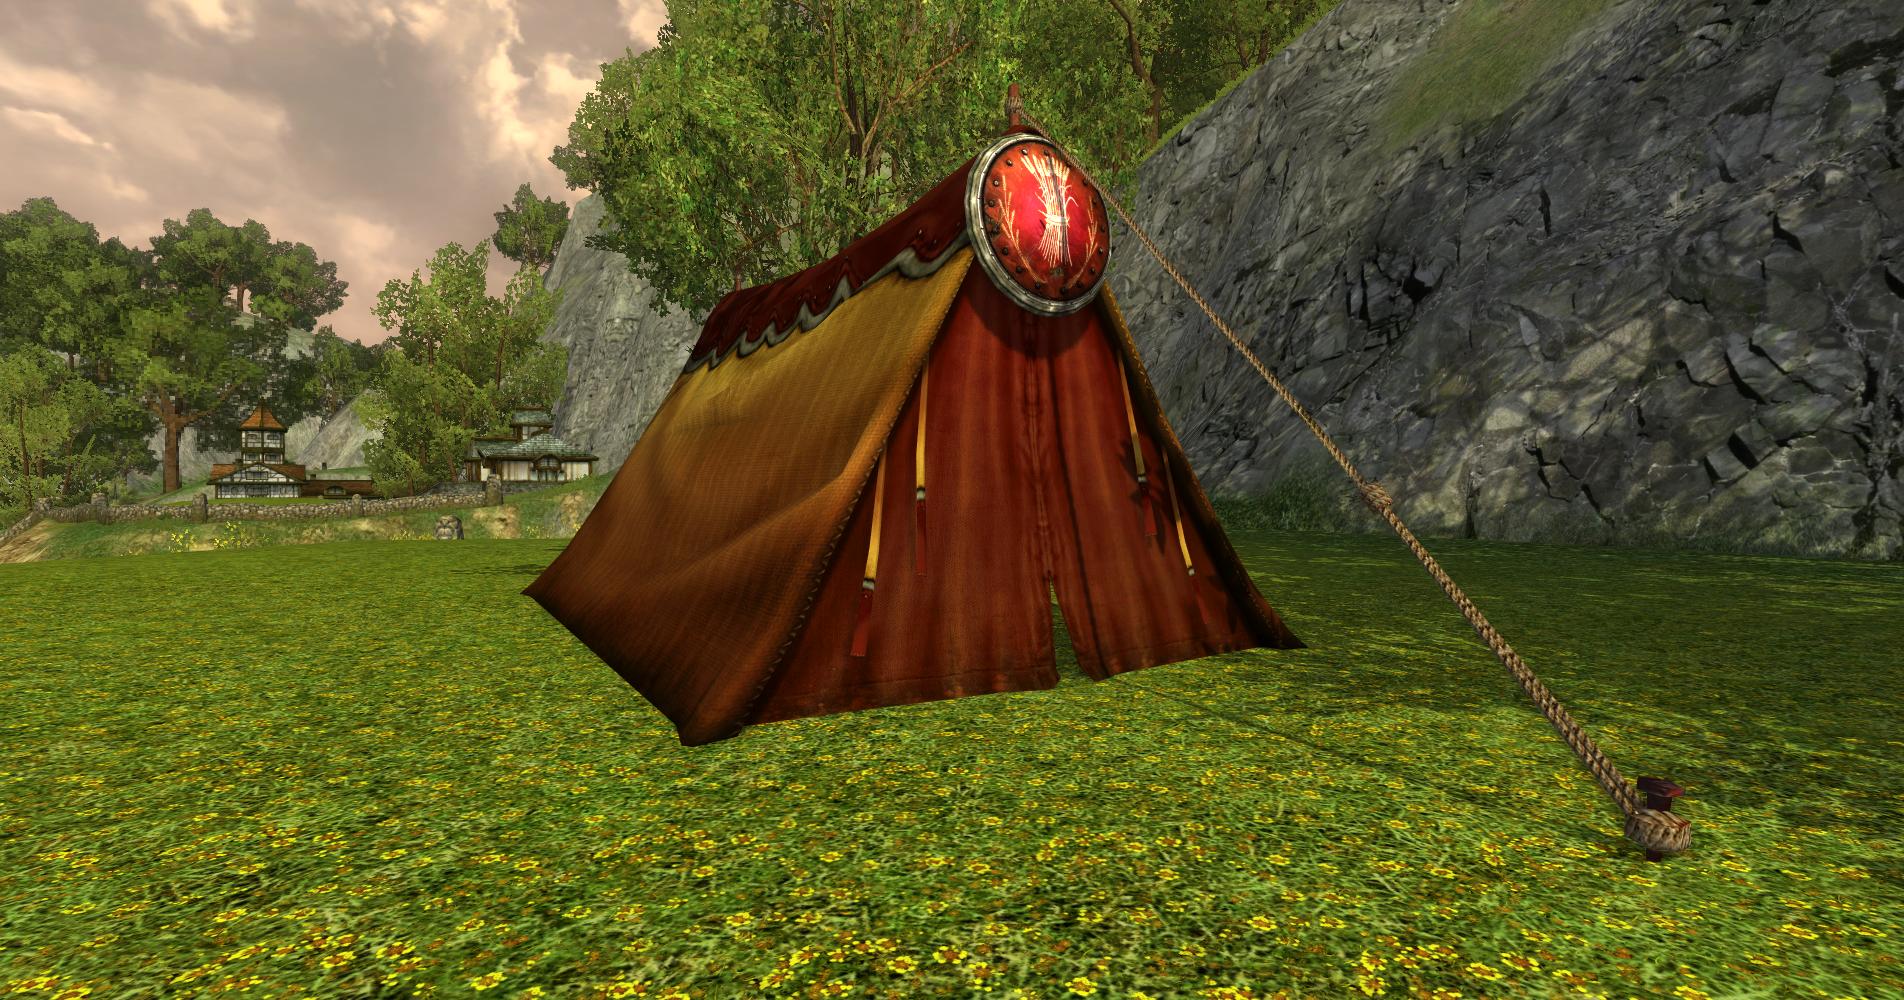 Tente des Sutcrofts